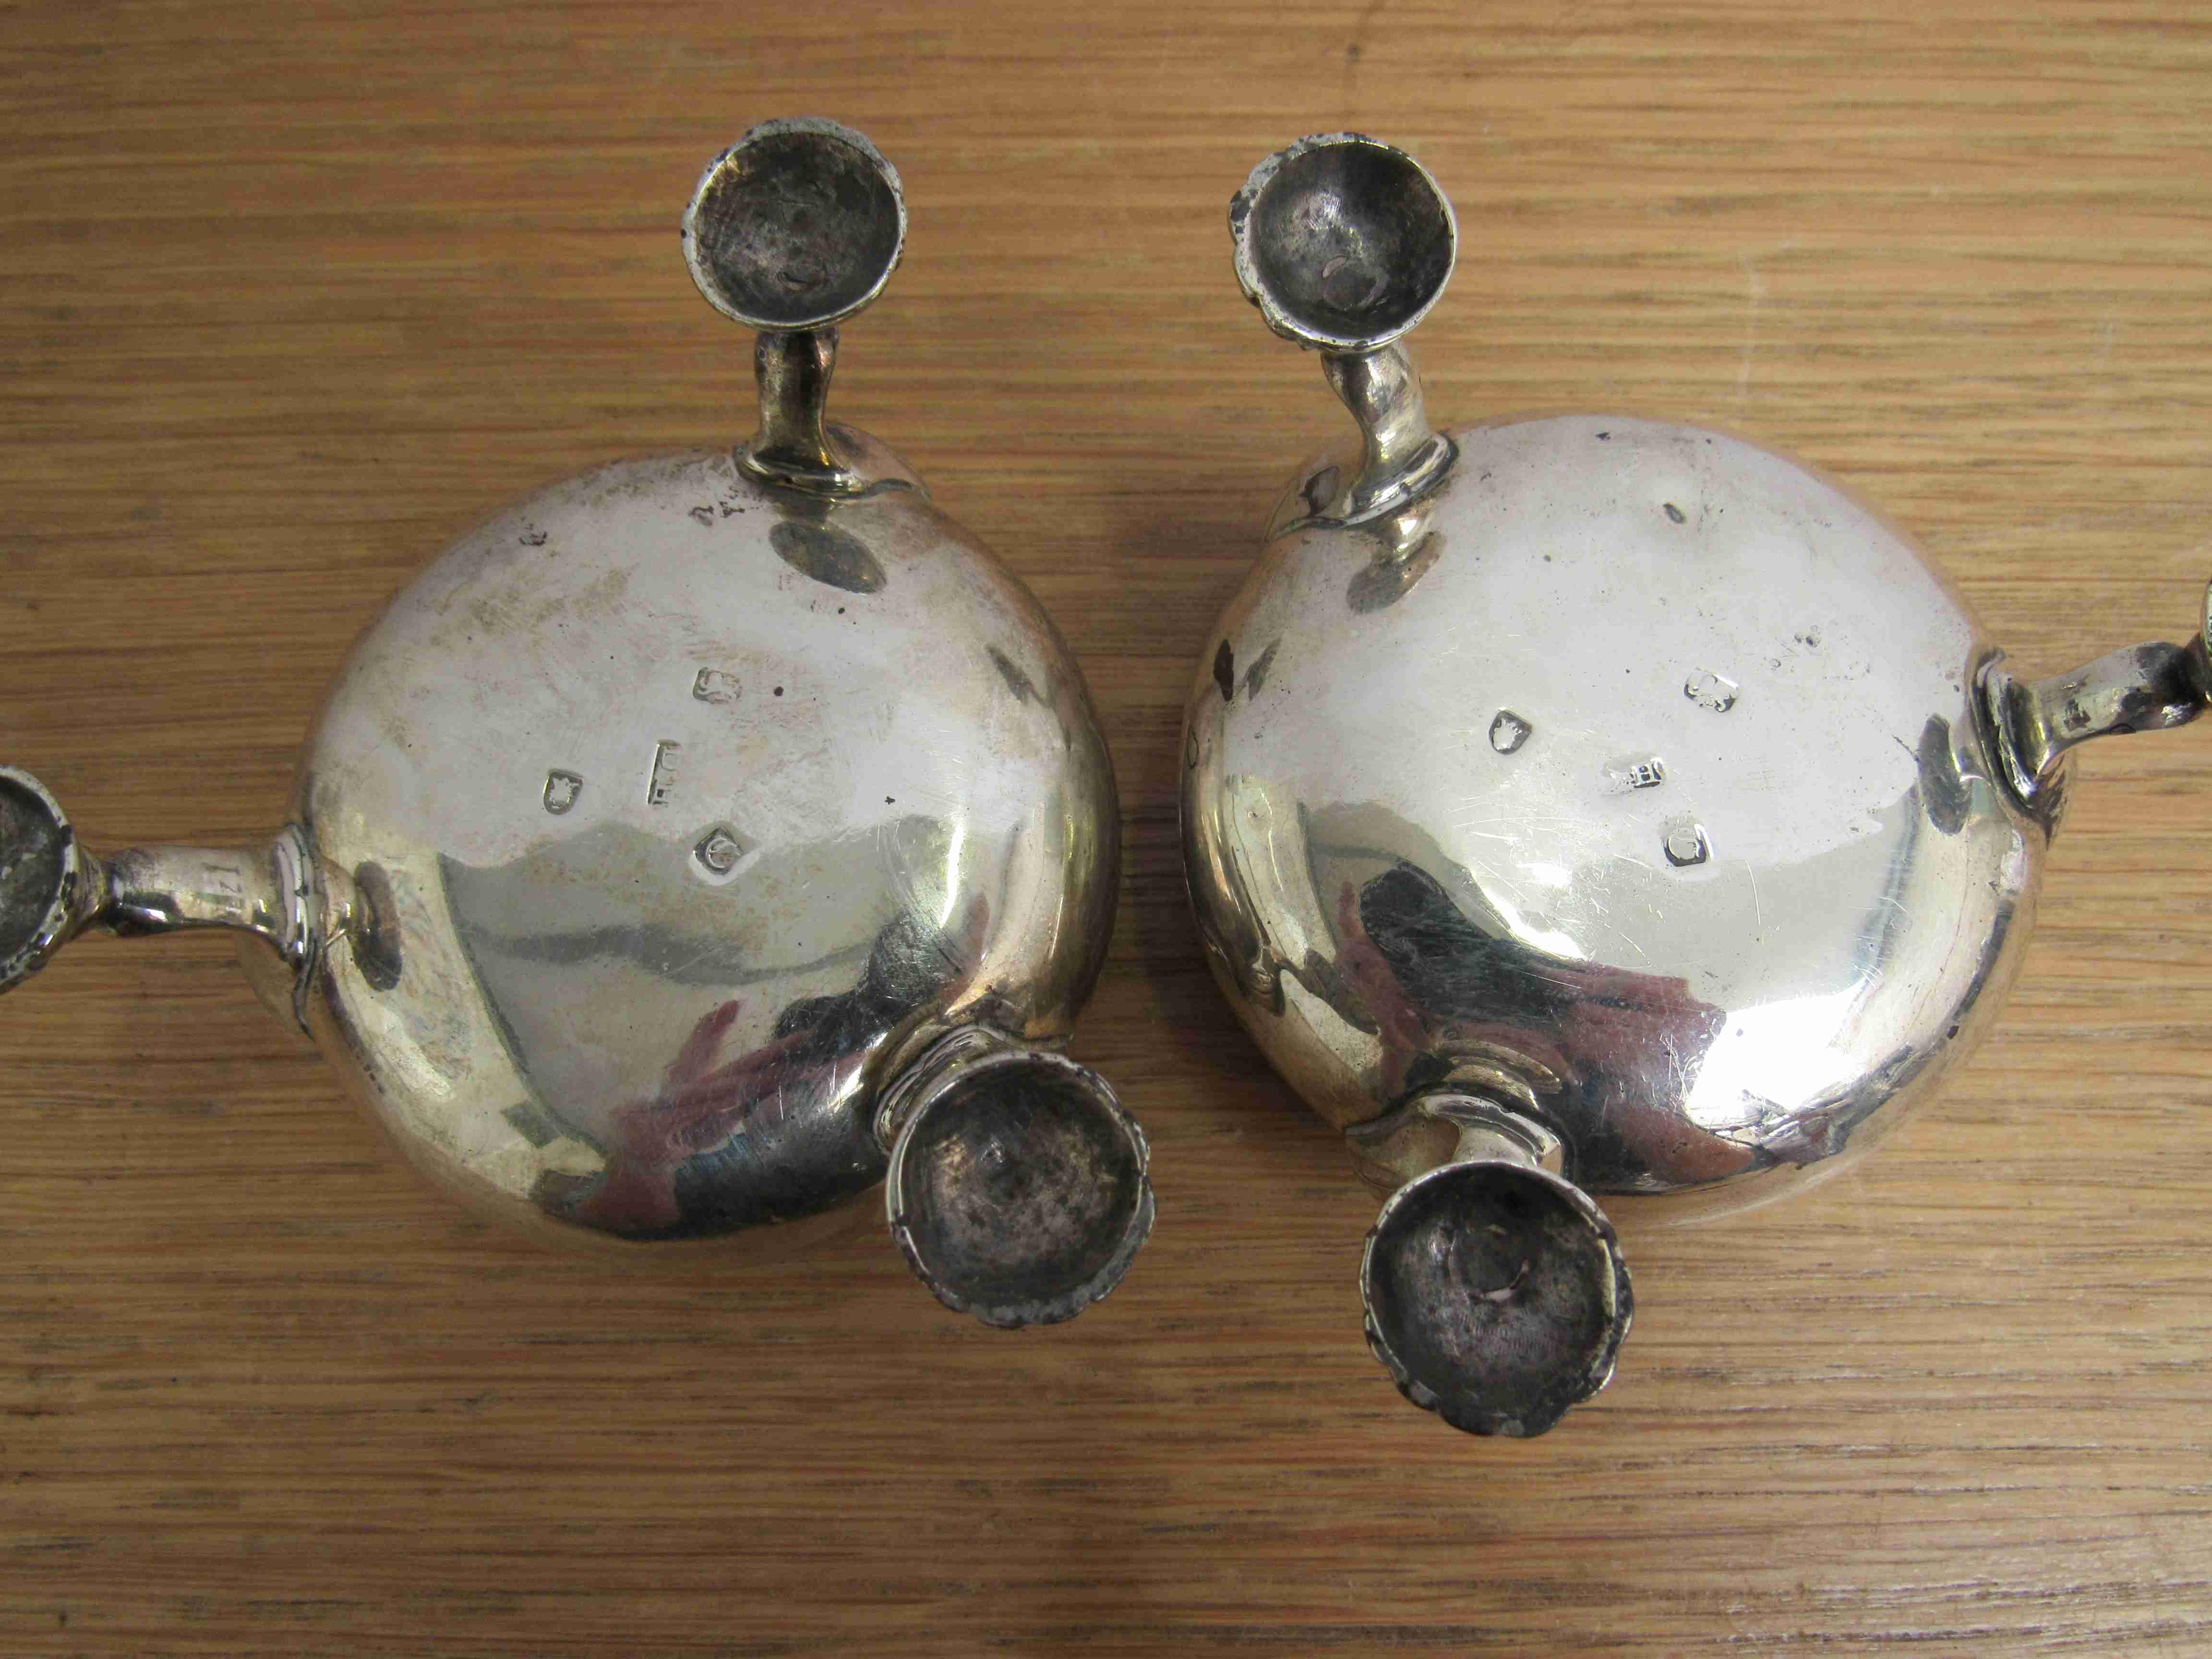 Lot 6 - A pair of George III Daniel Hockley silver salts raised on three feet, London 1762,